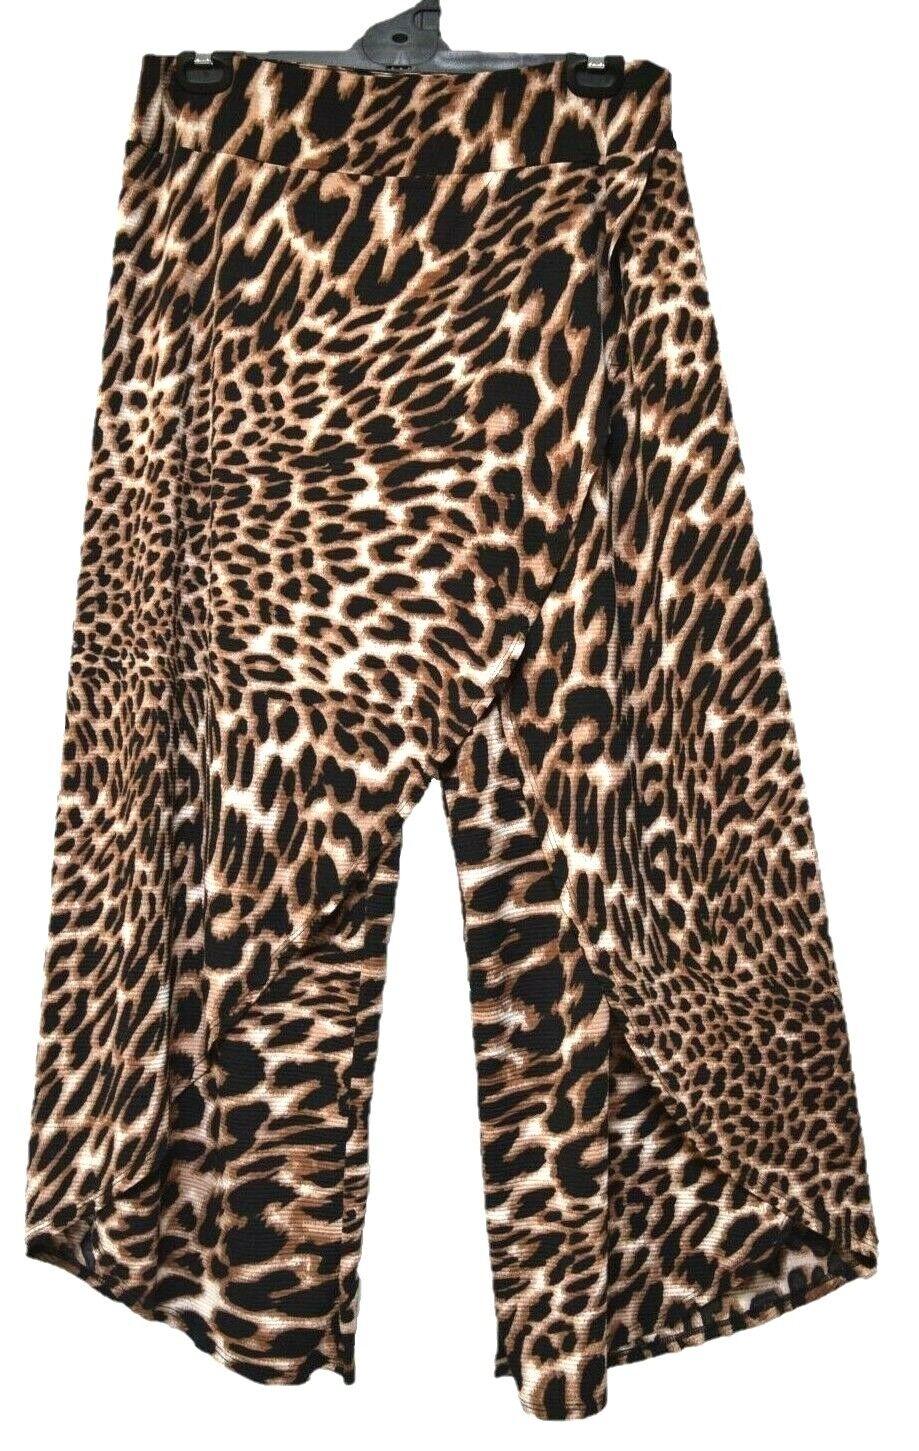 TS pants TAKING SHAPE plus sz S - M   18 Dina Pant wide 7 8 wrap leg floaty NWT